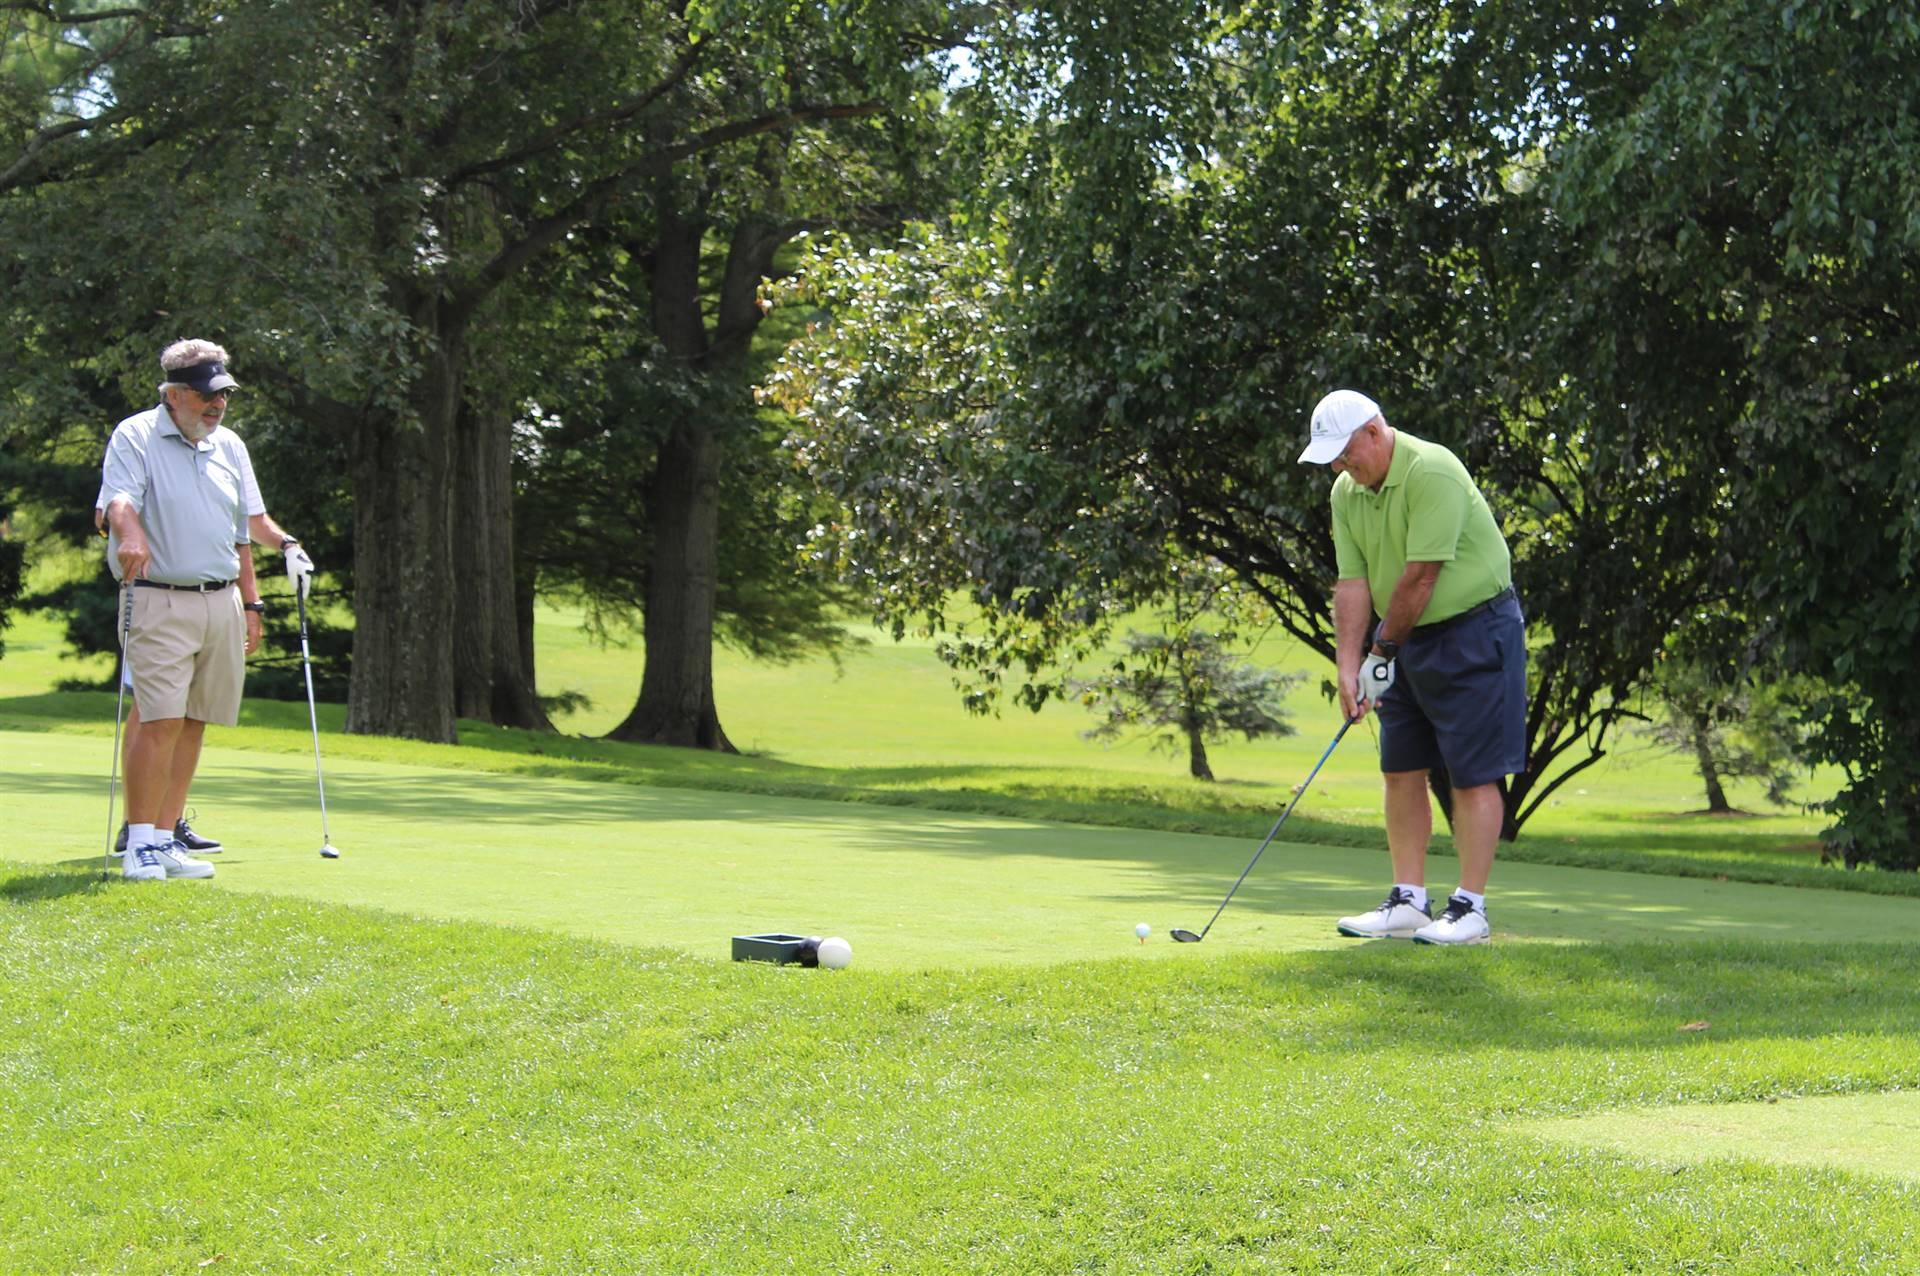 Golfing-Guys